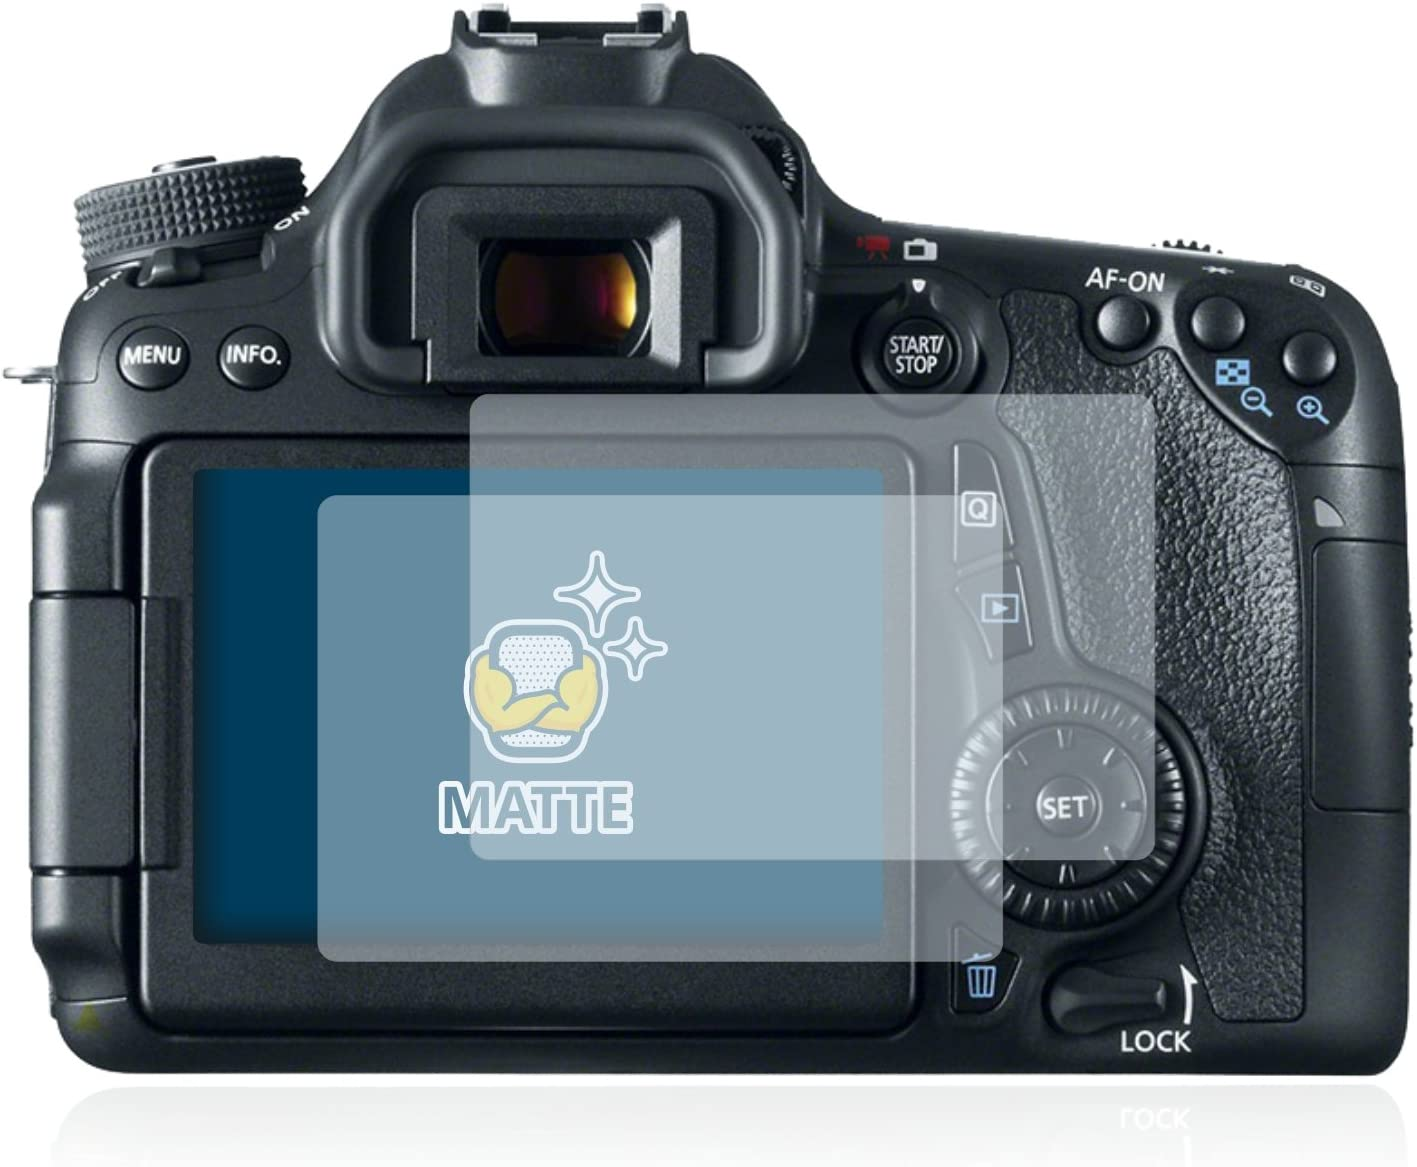 Anti-Fingerprint Anti-Reflex BROTECT 2X Entspiegelungs-Schutzfolie kompatibel mit Canon EOS 70D Displayschutz-Folie Matt